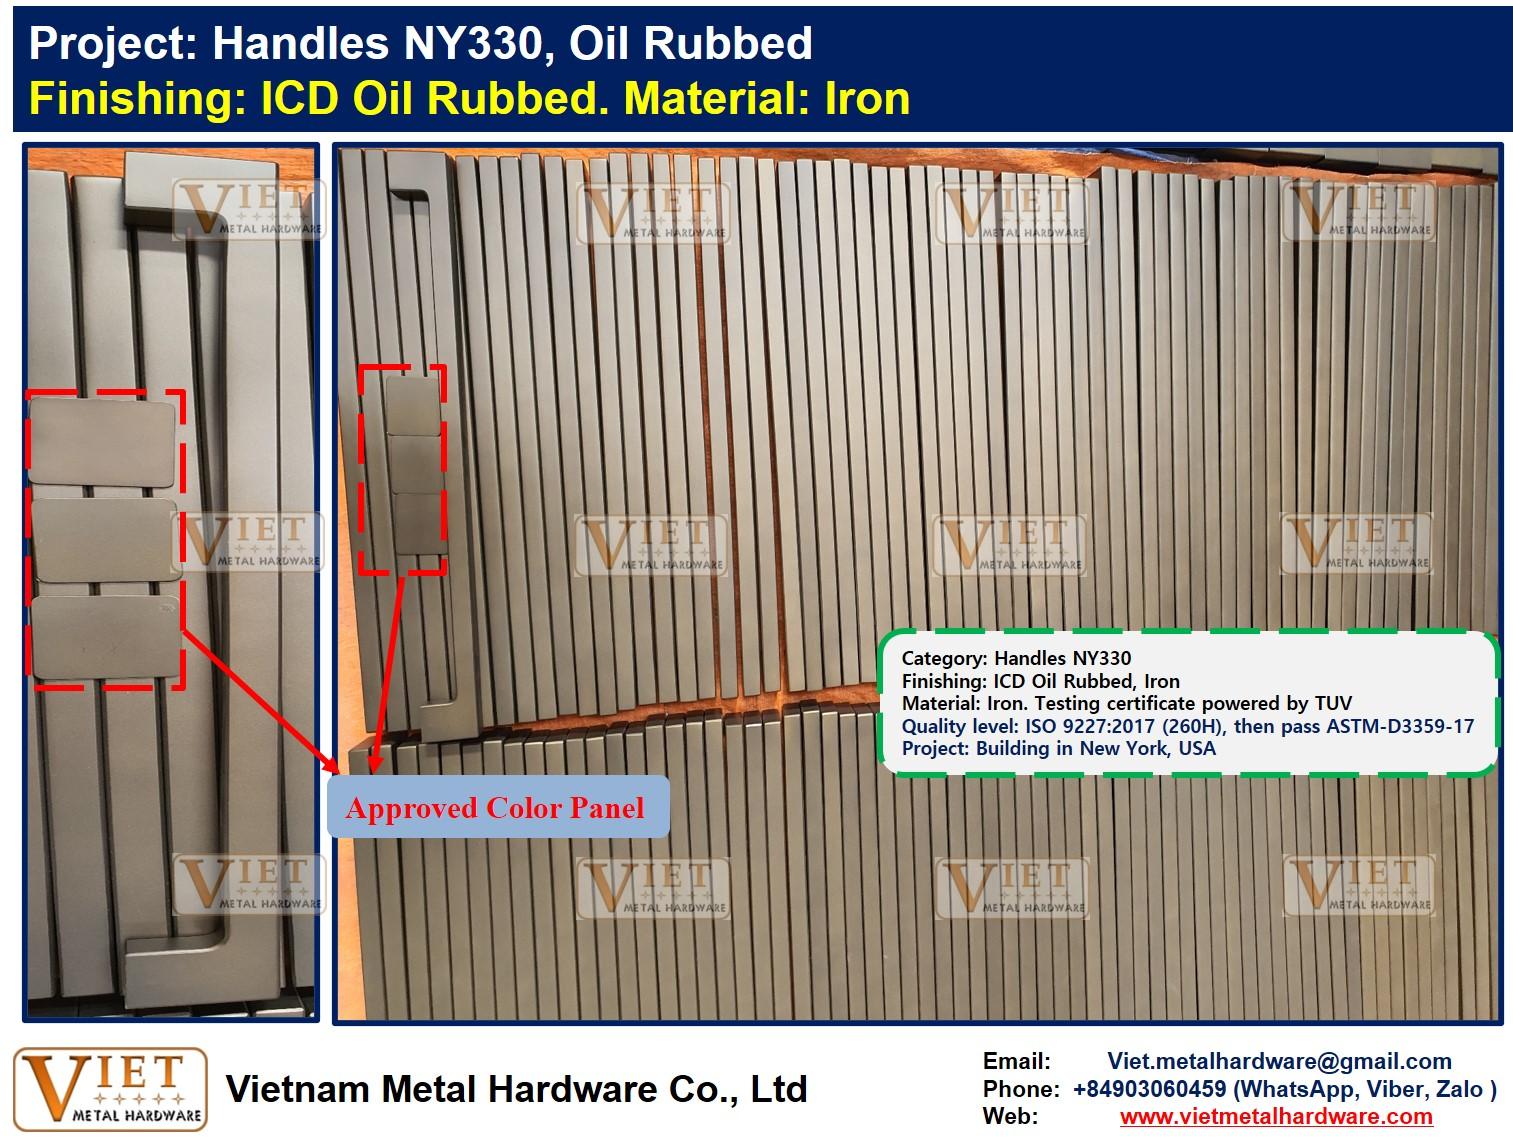 Handles NY330, Oil Rubbed